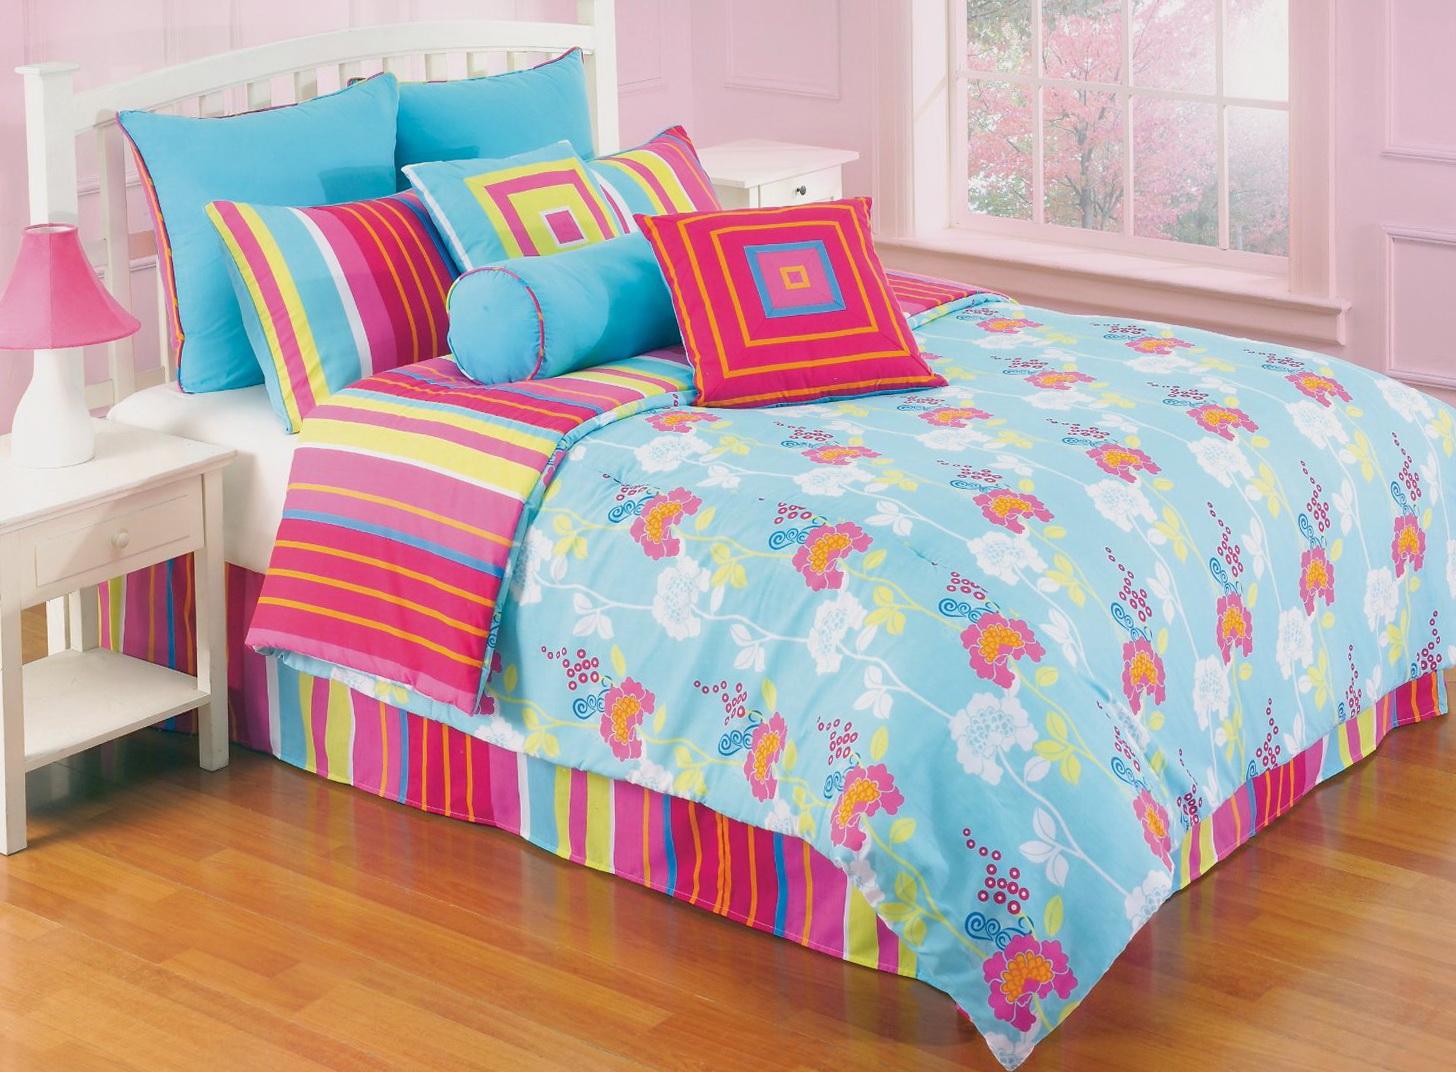 Girly Full Size Bedding Sets